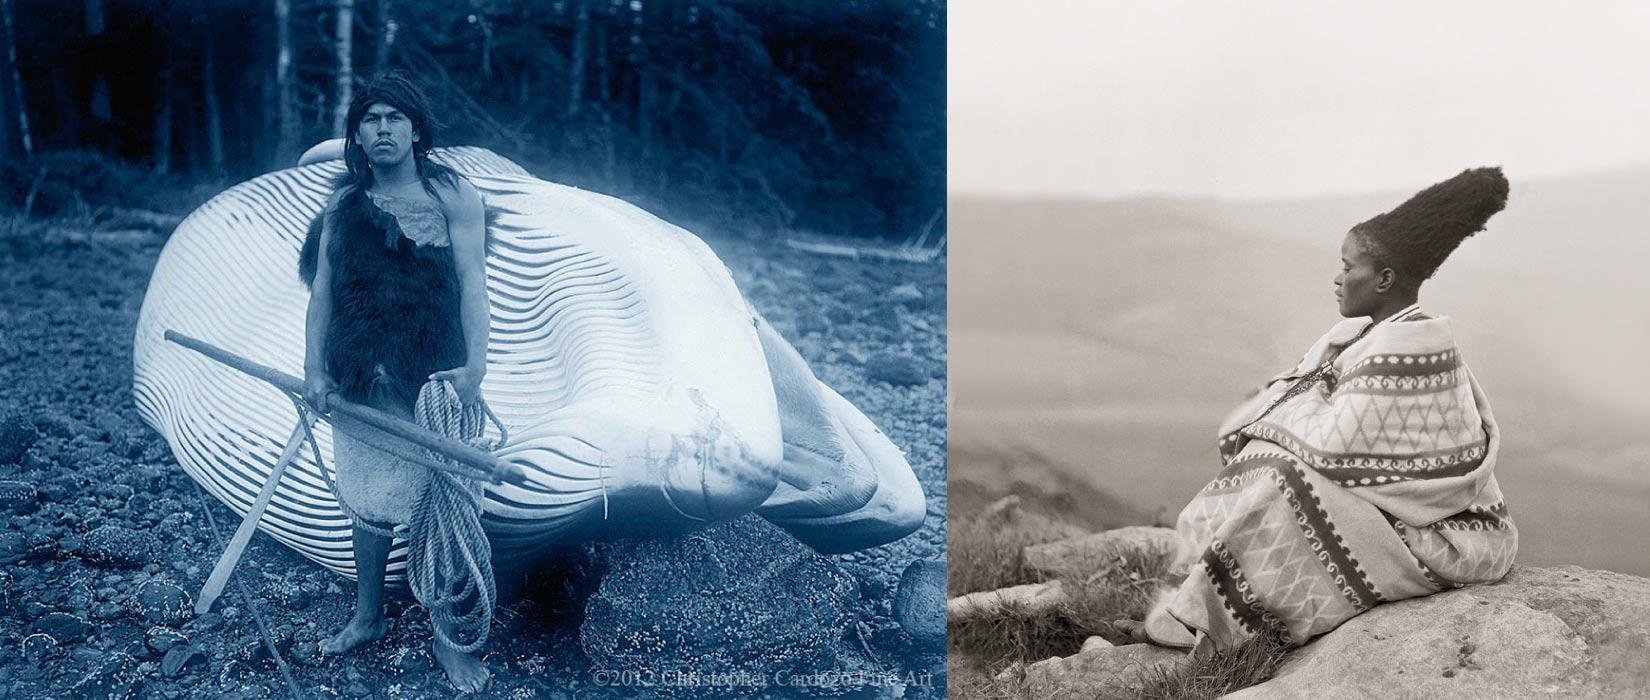 Montana with whale - Hesquiat (Nootka), Curtis [left] & Zulu woman (Duggan-Cronin)